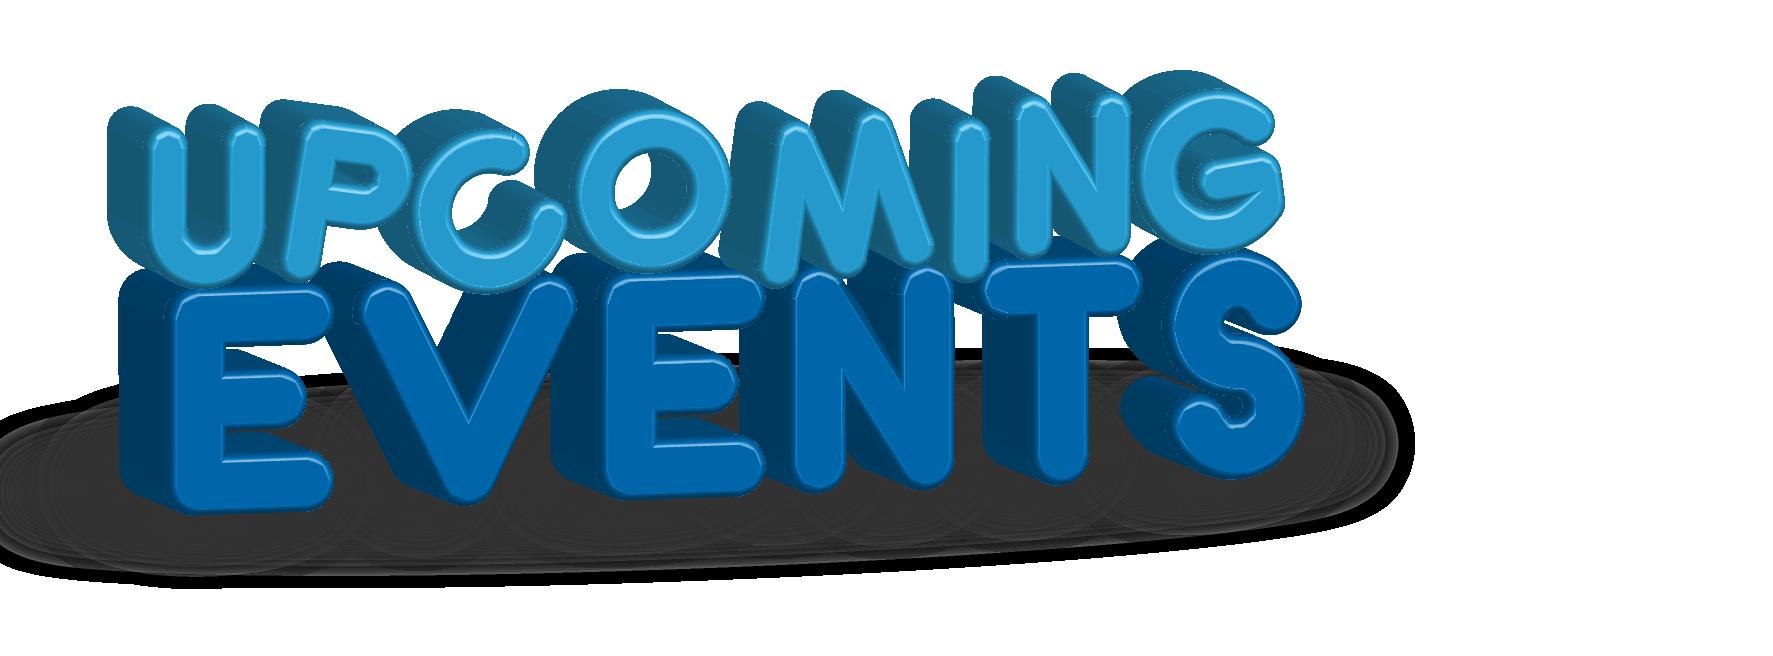 3D Upcoming Events Clipart-3D Upcoming Events Clipart-0